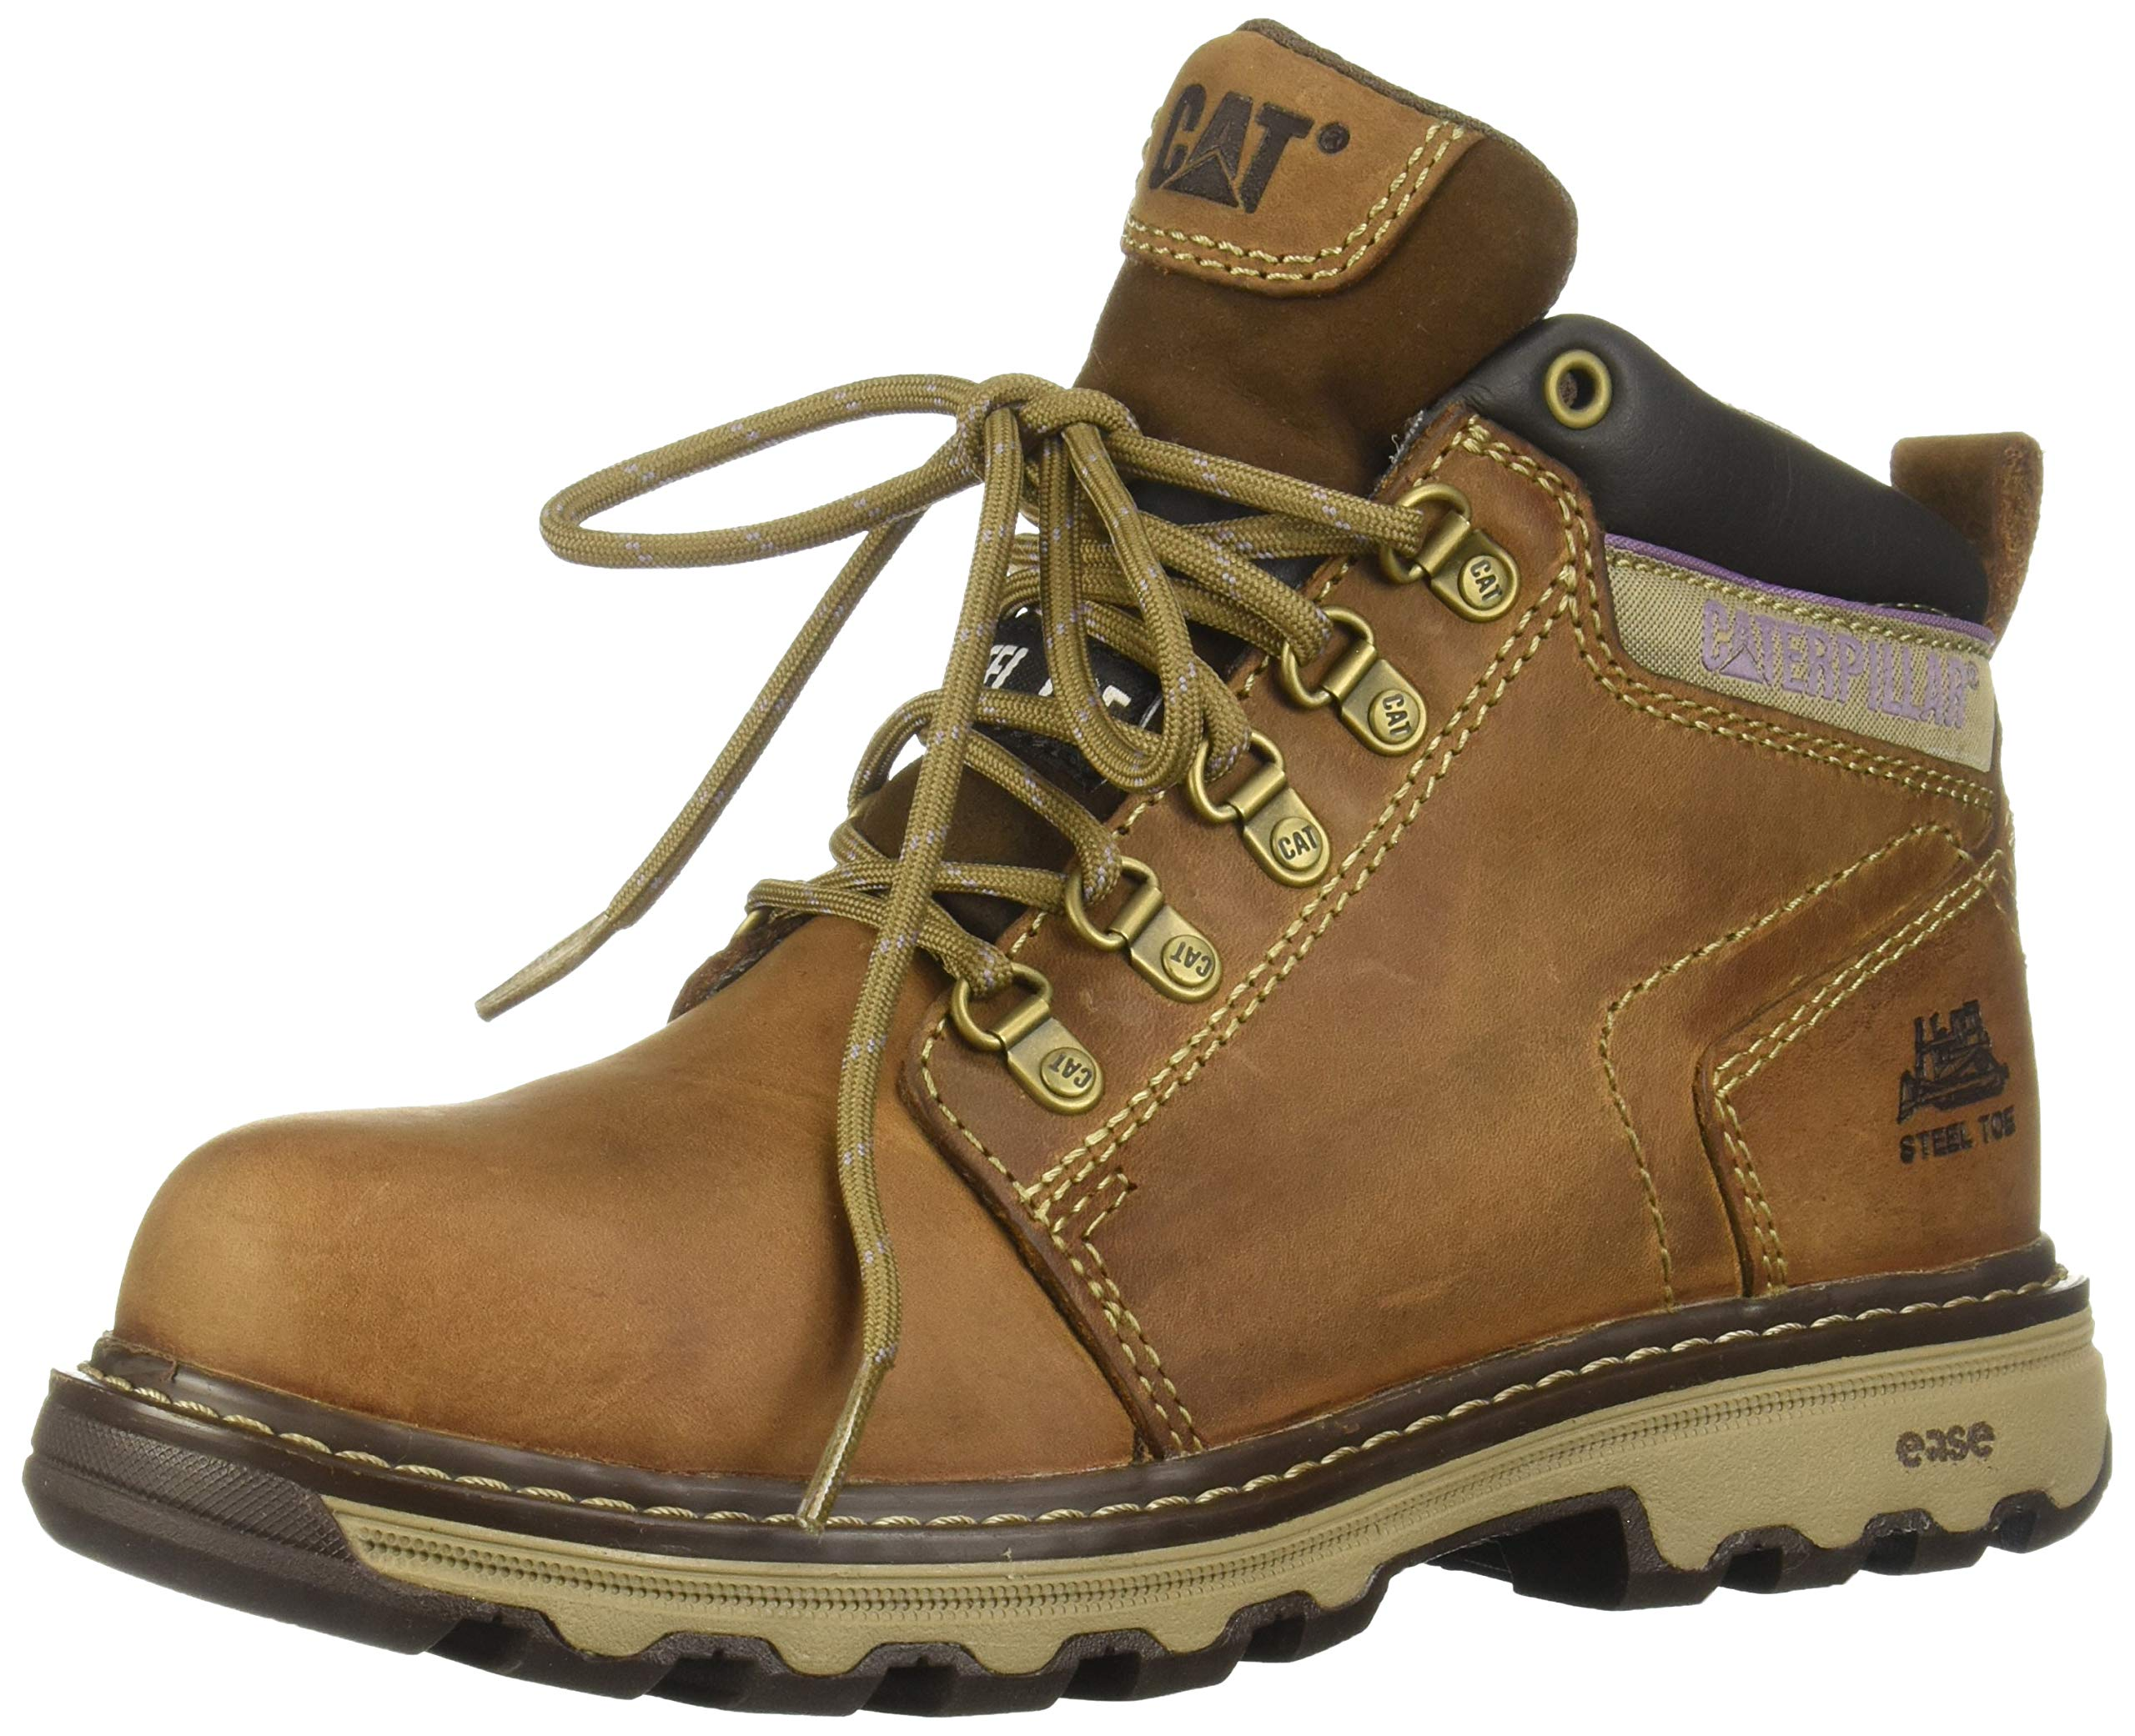 Caterpillar Women's Ellie Steel Toe Work Boot, Dark Beige, 9 M US by Caterpillar